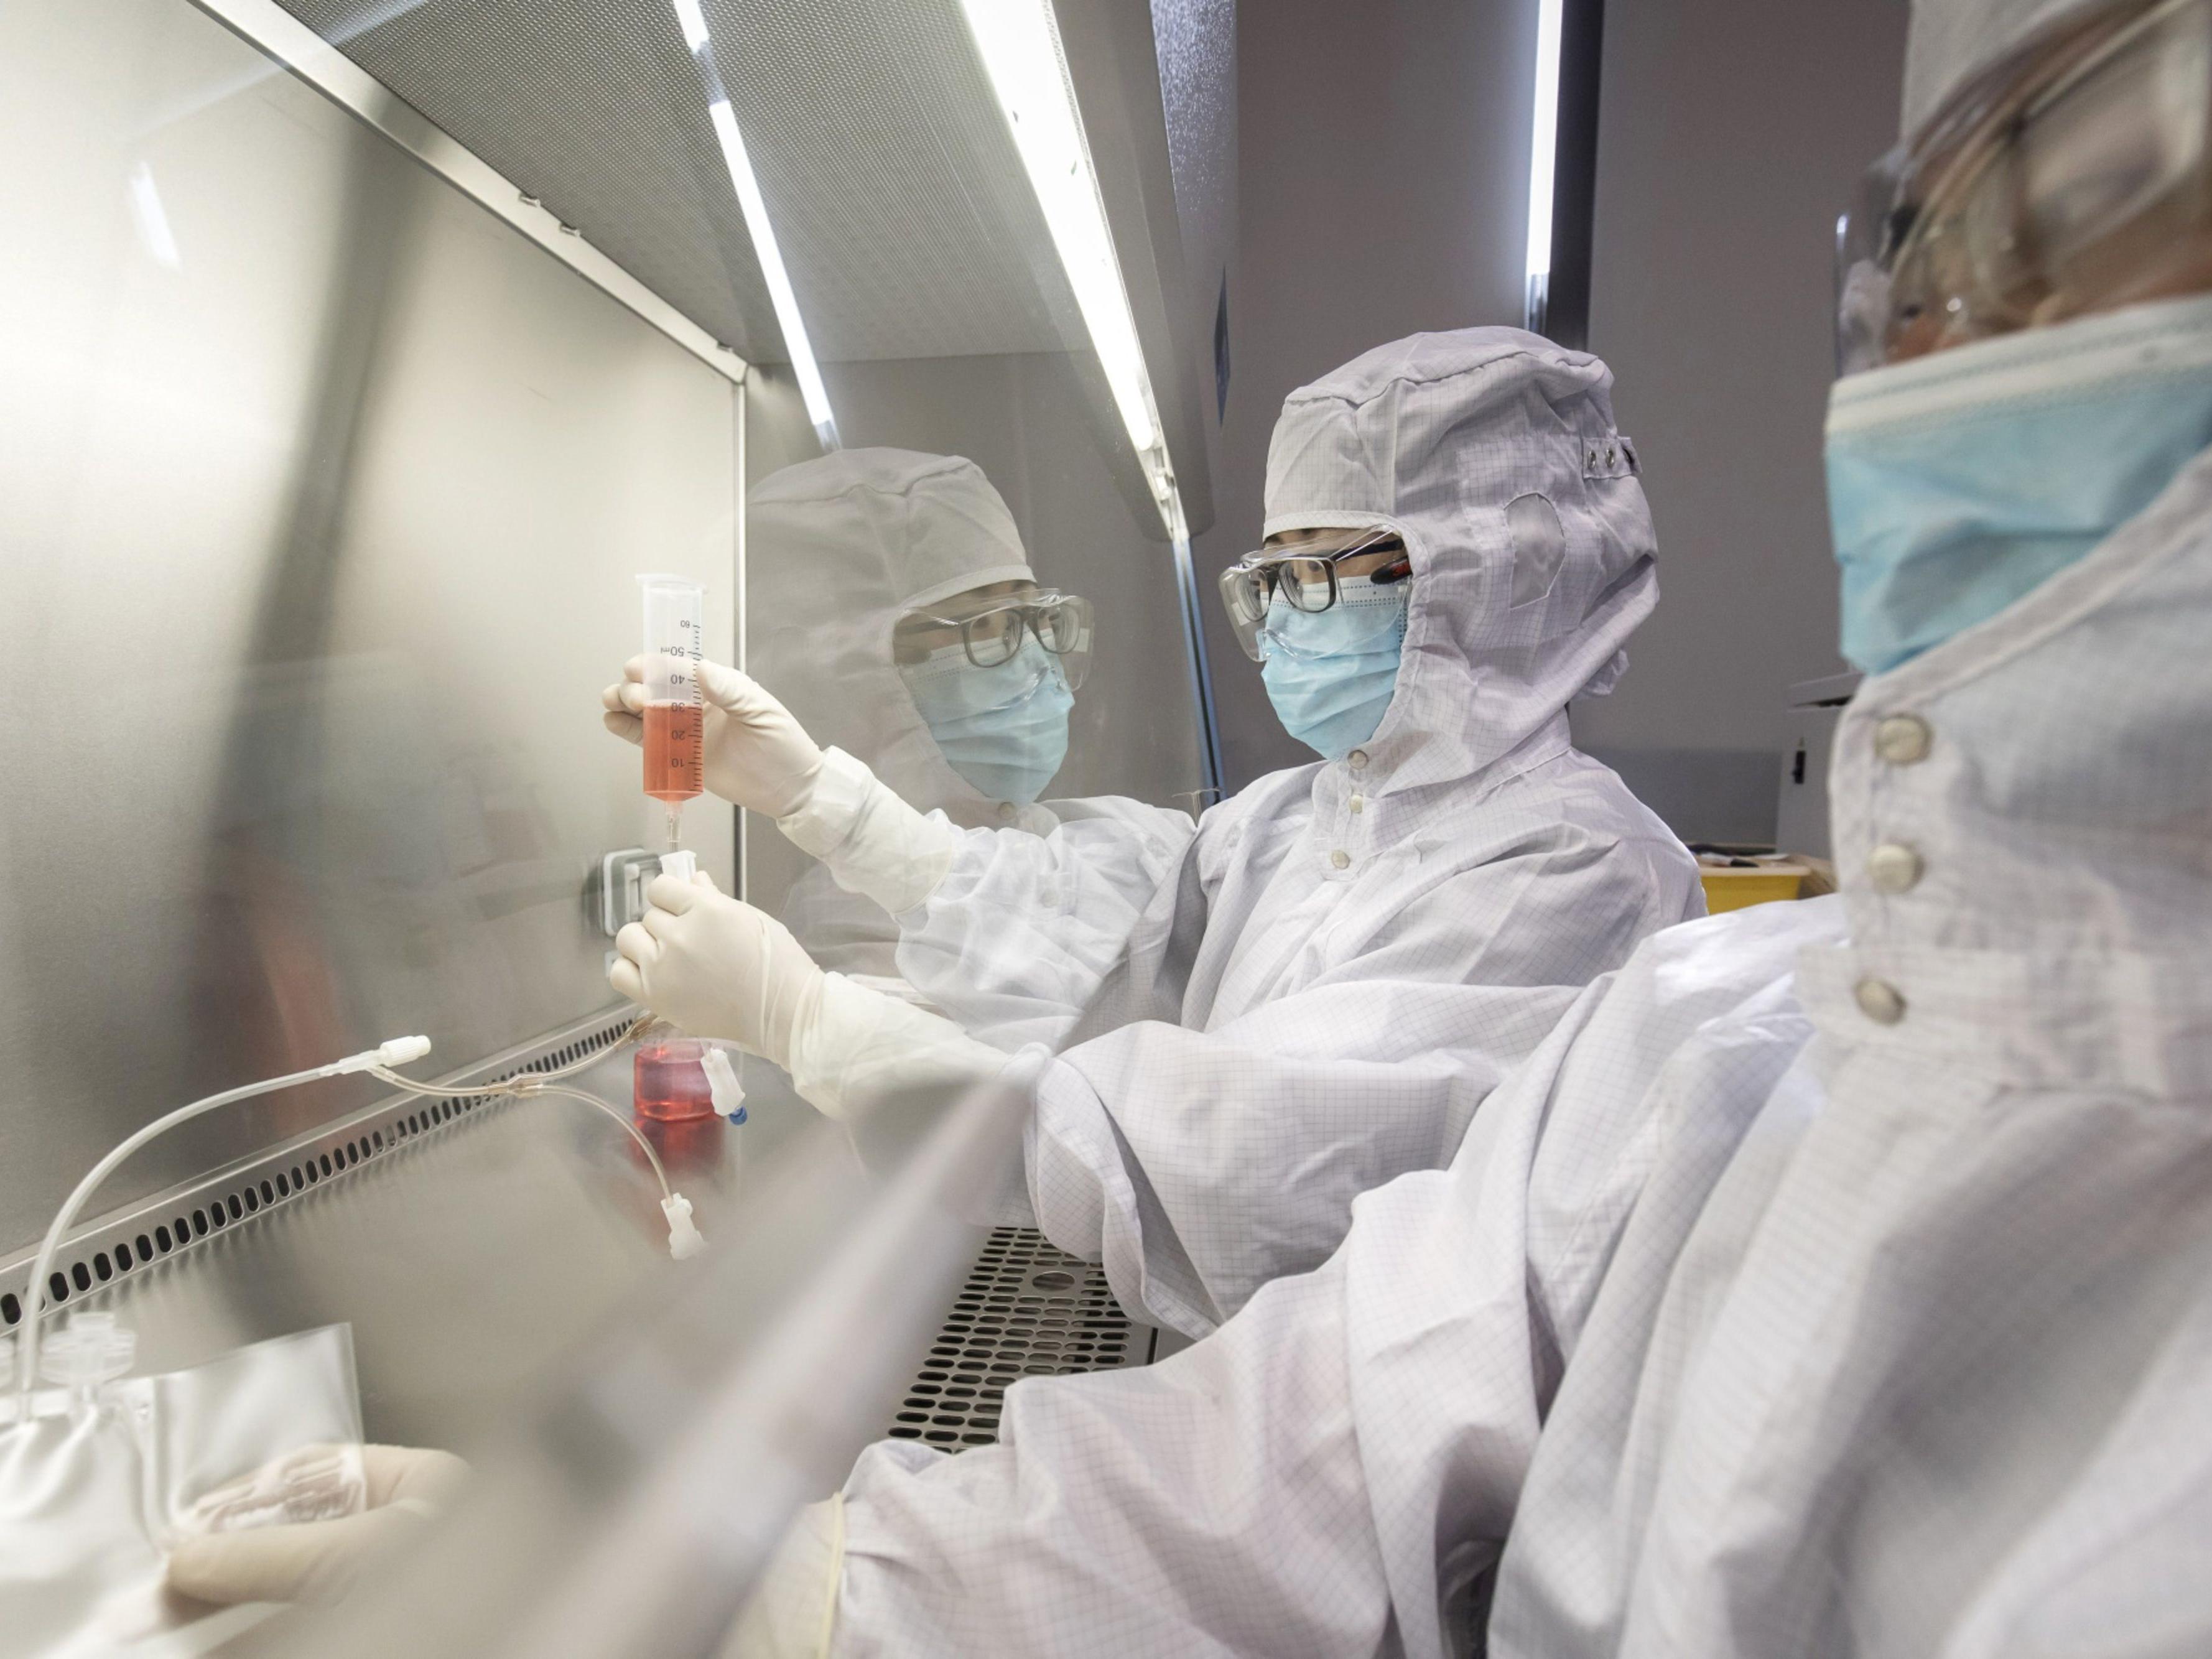 Despite Testing Improvements, U.S. Labs Face Endless Logistical Failures